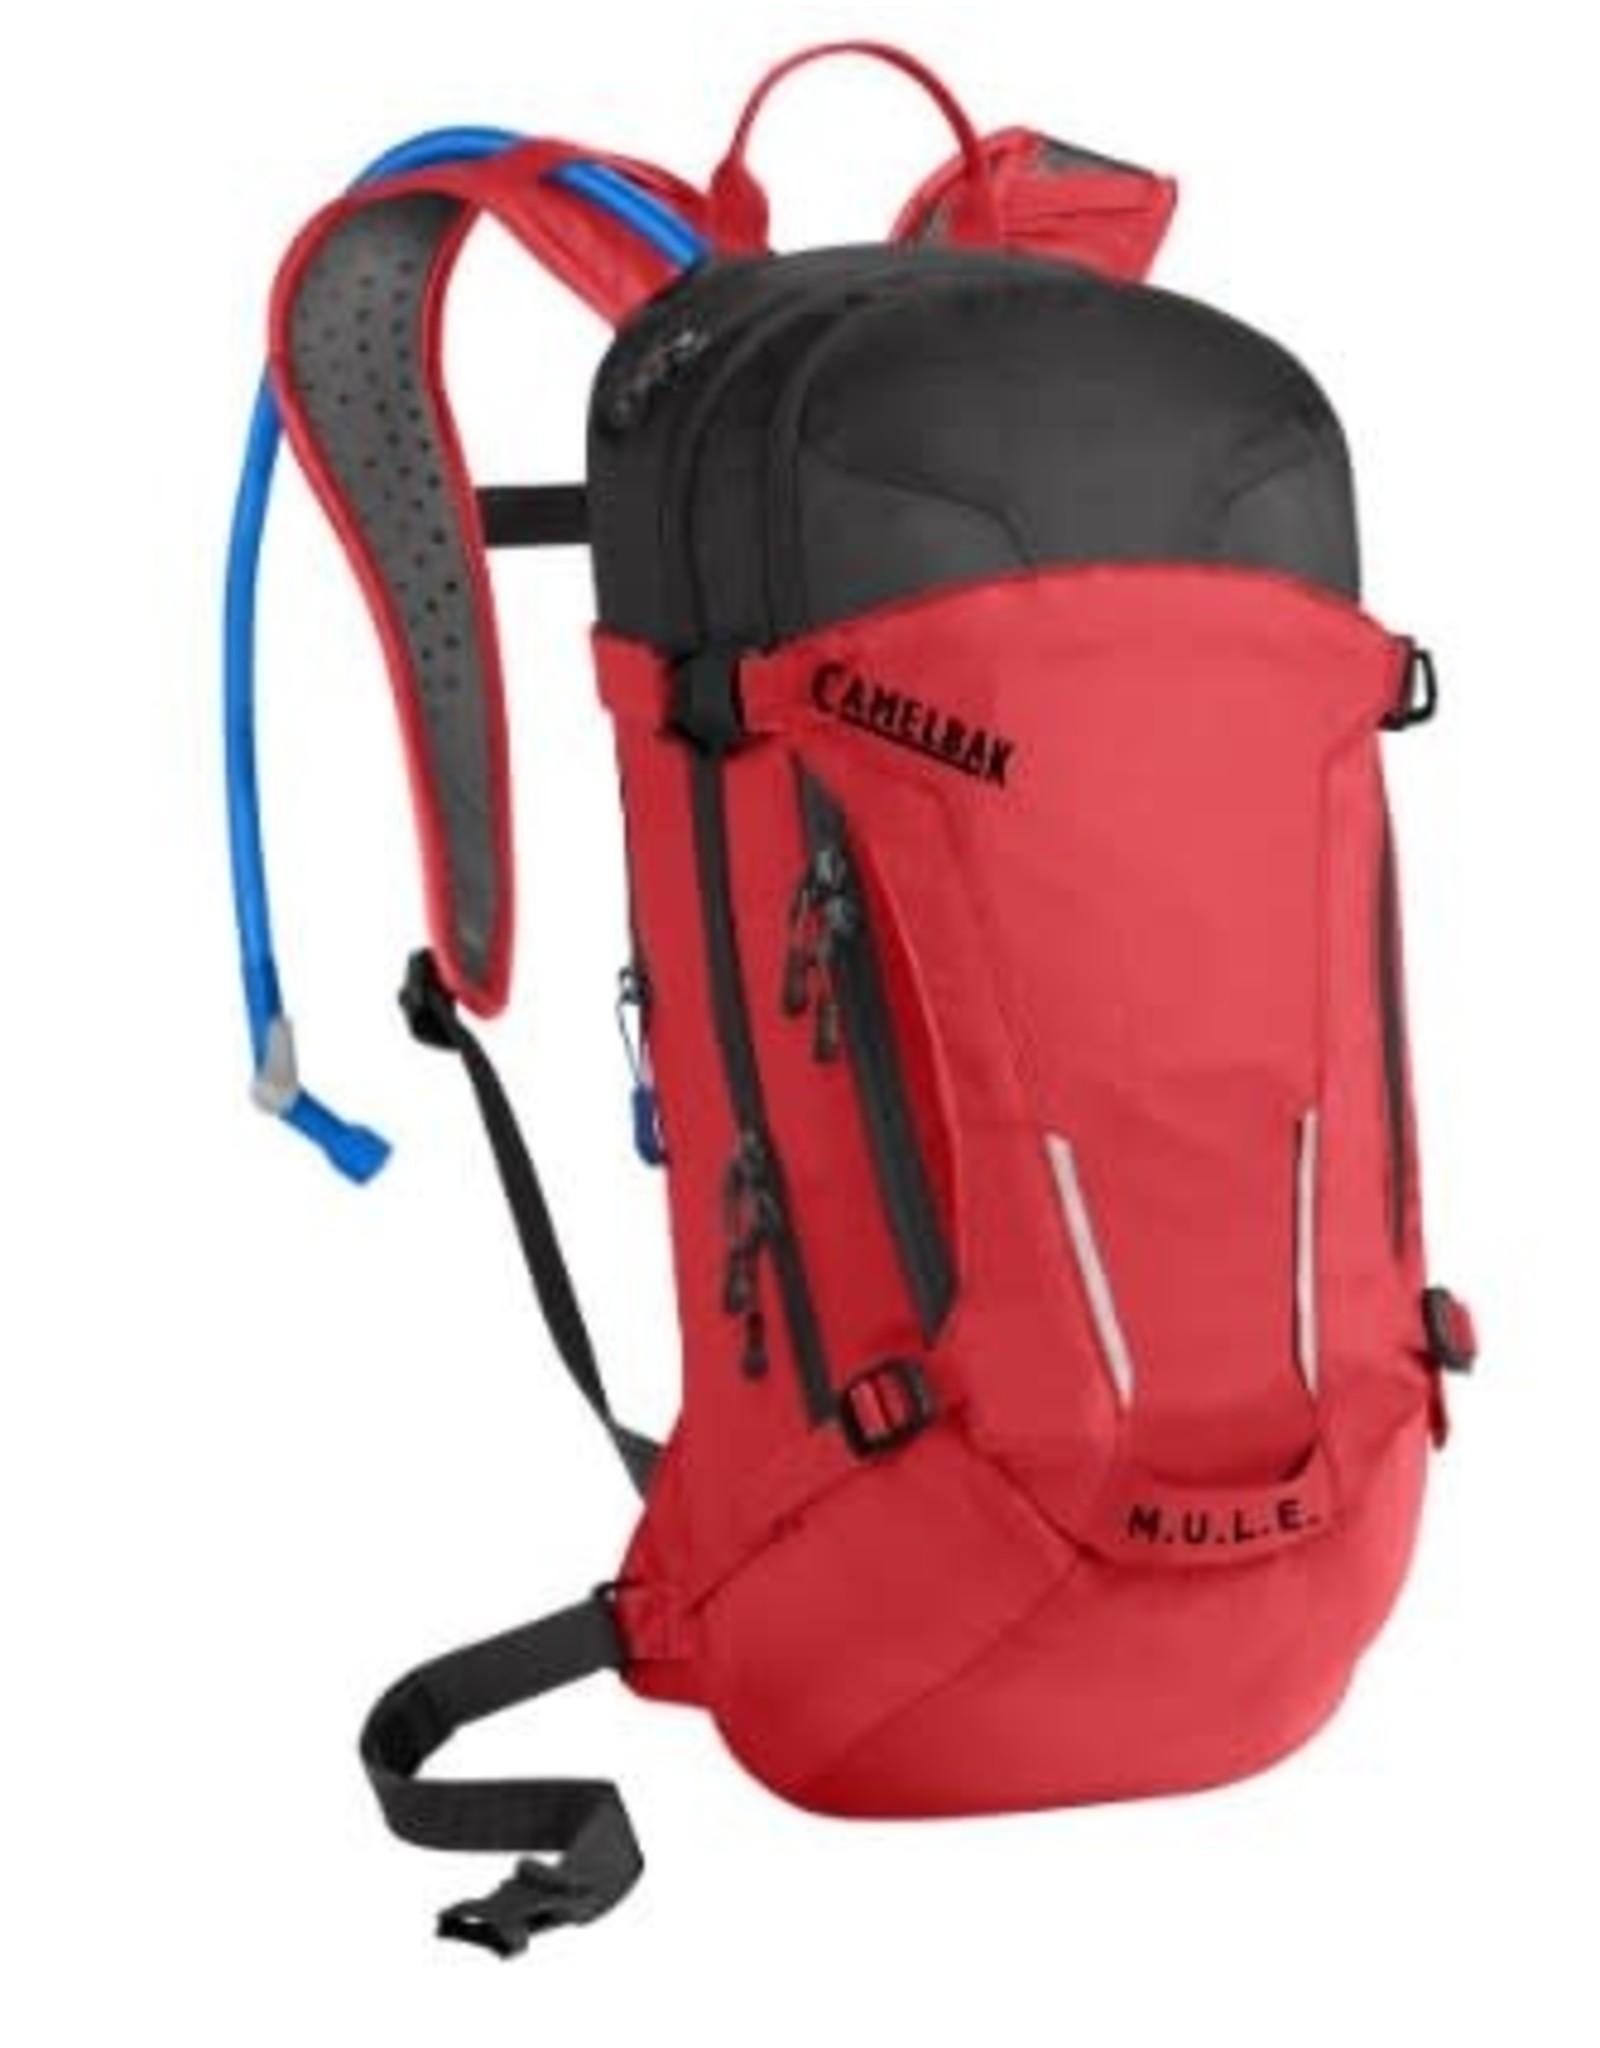 Camelbak Hydratation bag Camelbak MULE 100oz/3L